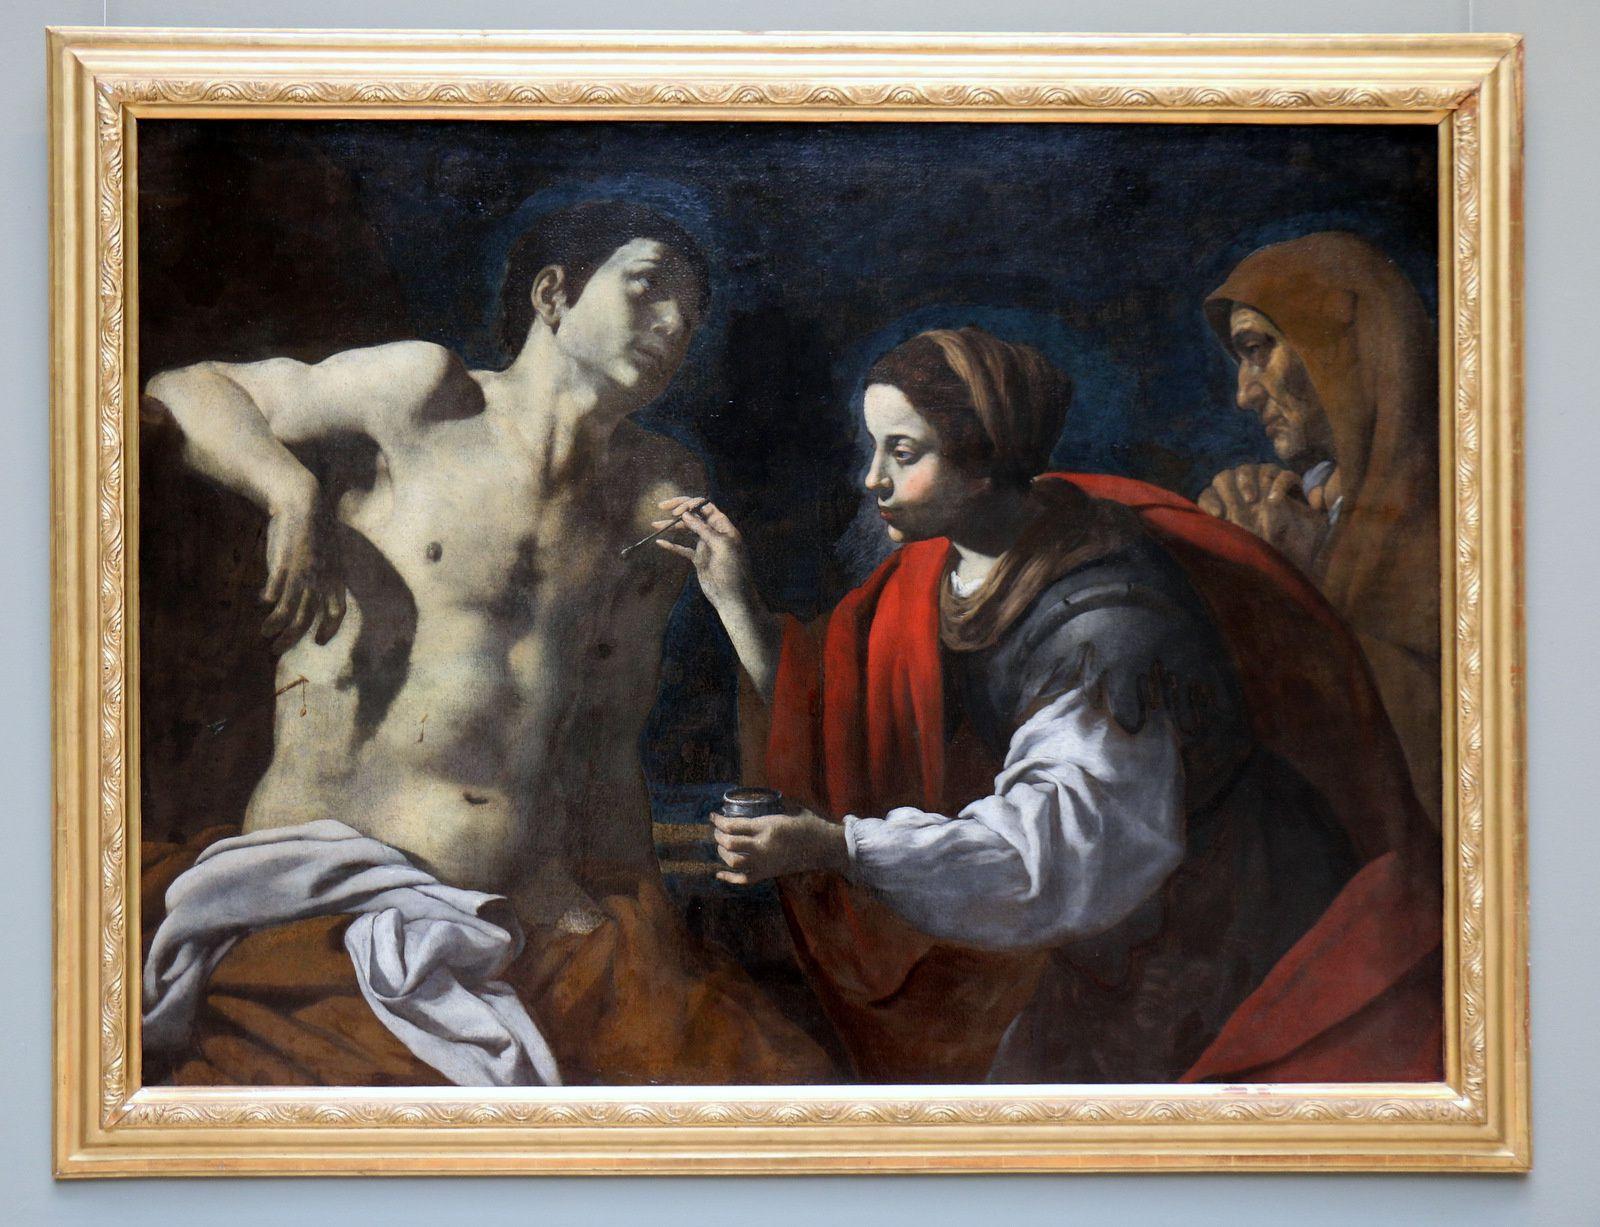 Saint Sébastien soigné par Irène, tableau de Giovan Battista Caracciolo